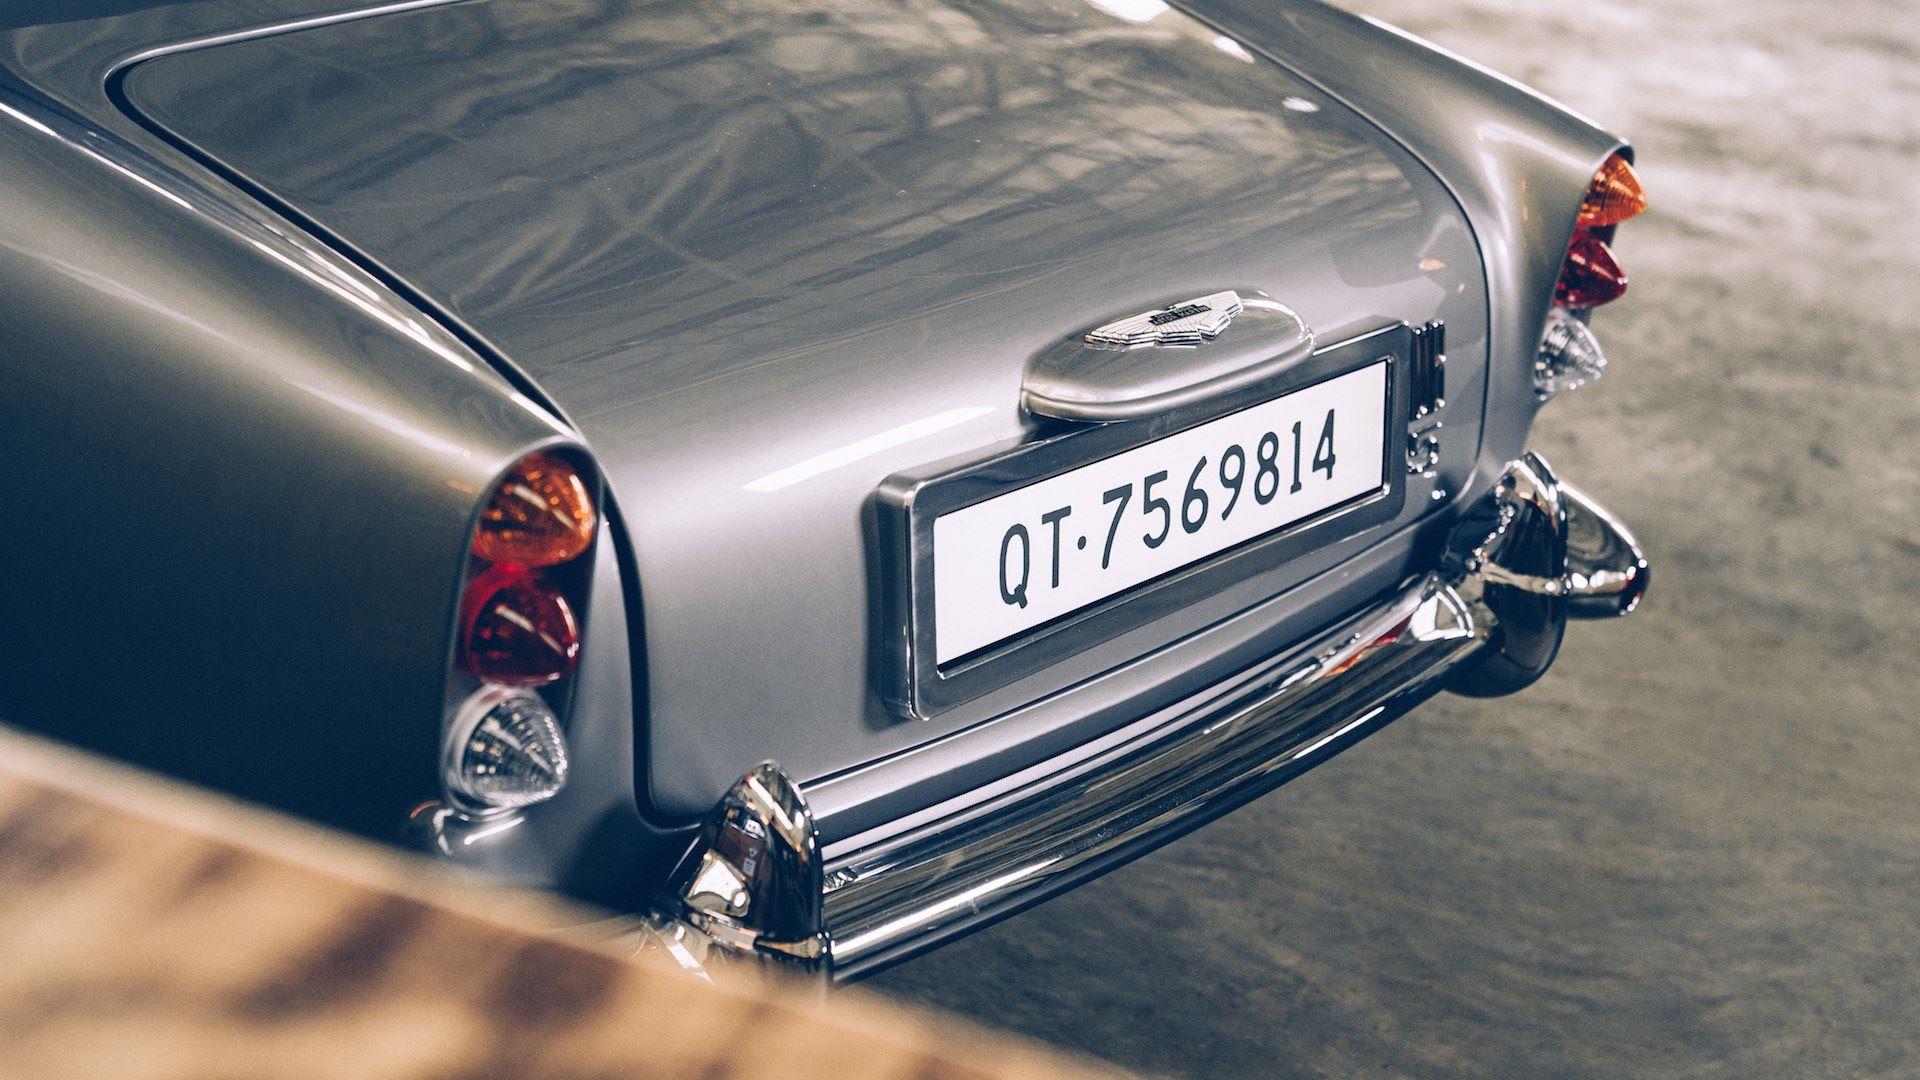 Aston-Martin-DB5-Junior-James-Bond-Edition-7